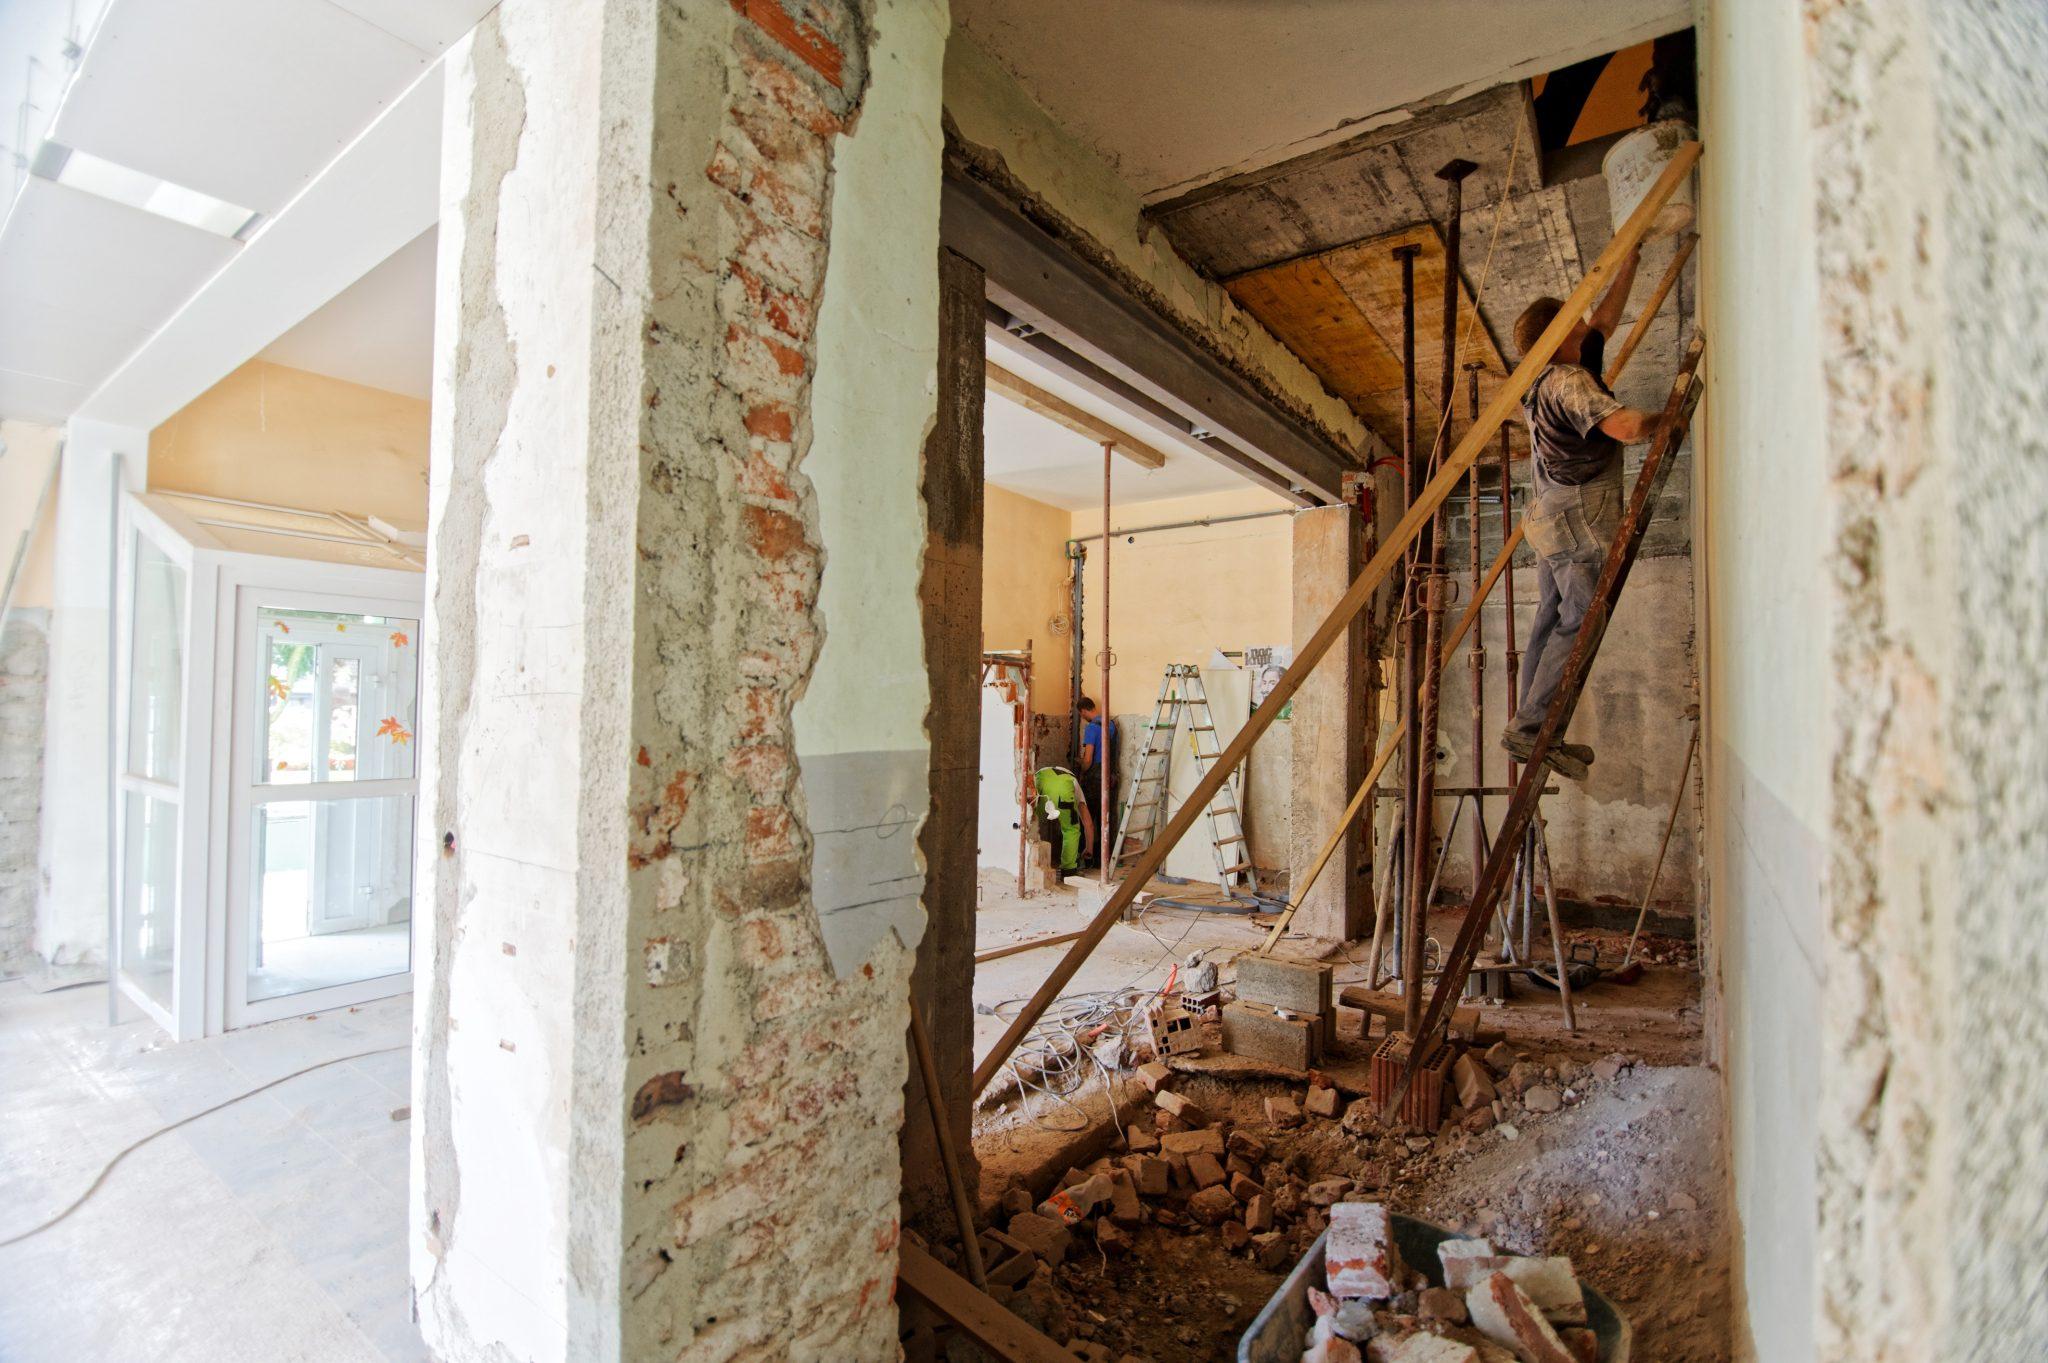 Investing in Real Estate Using the BRRRR Method